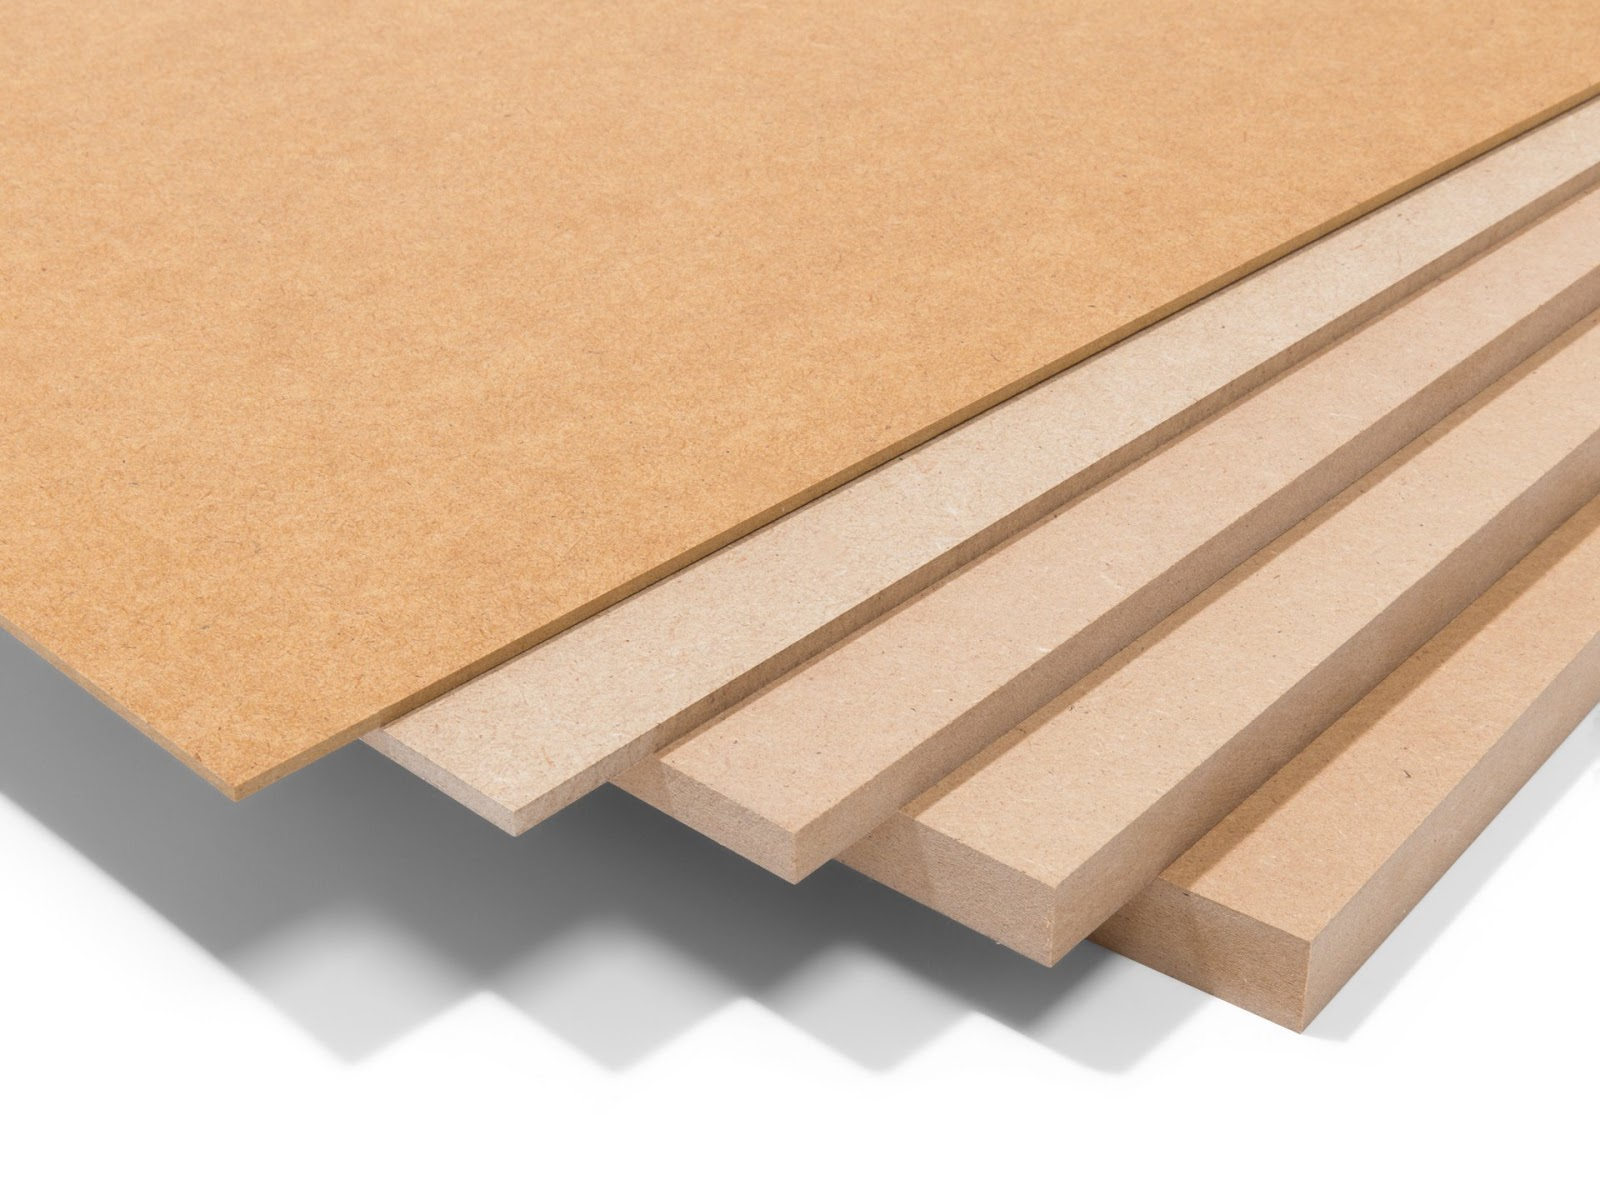 МДФ-панели, толщина 28 мм, размер 2800×2070 мм, Кастамону, F